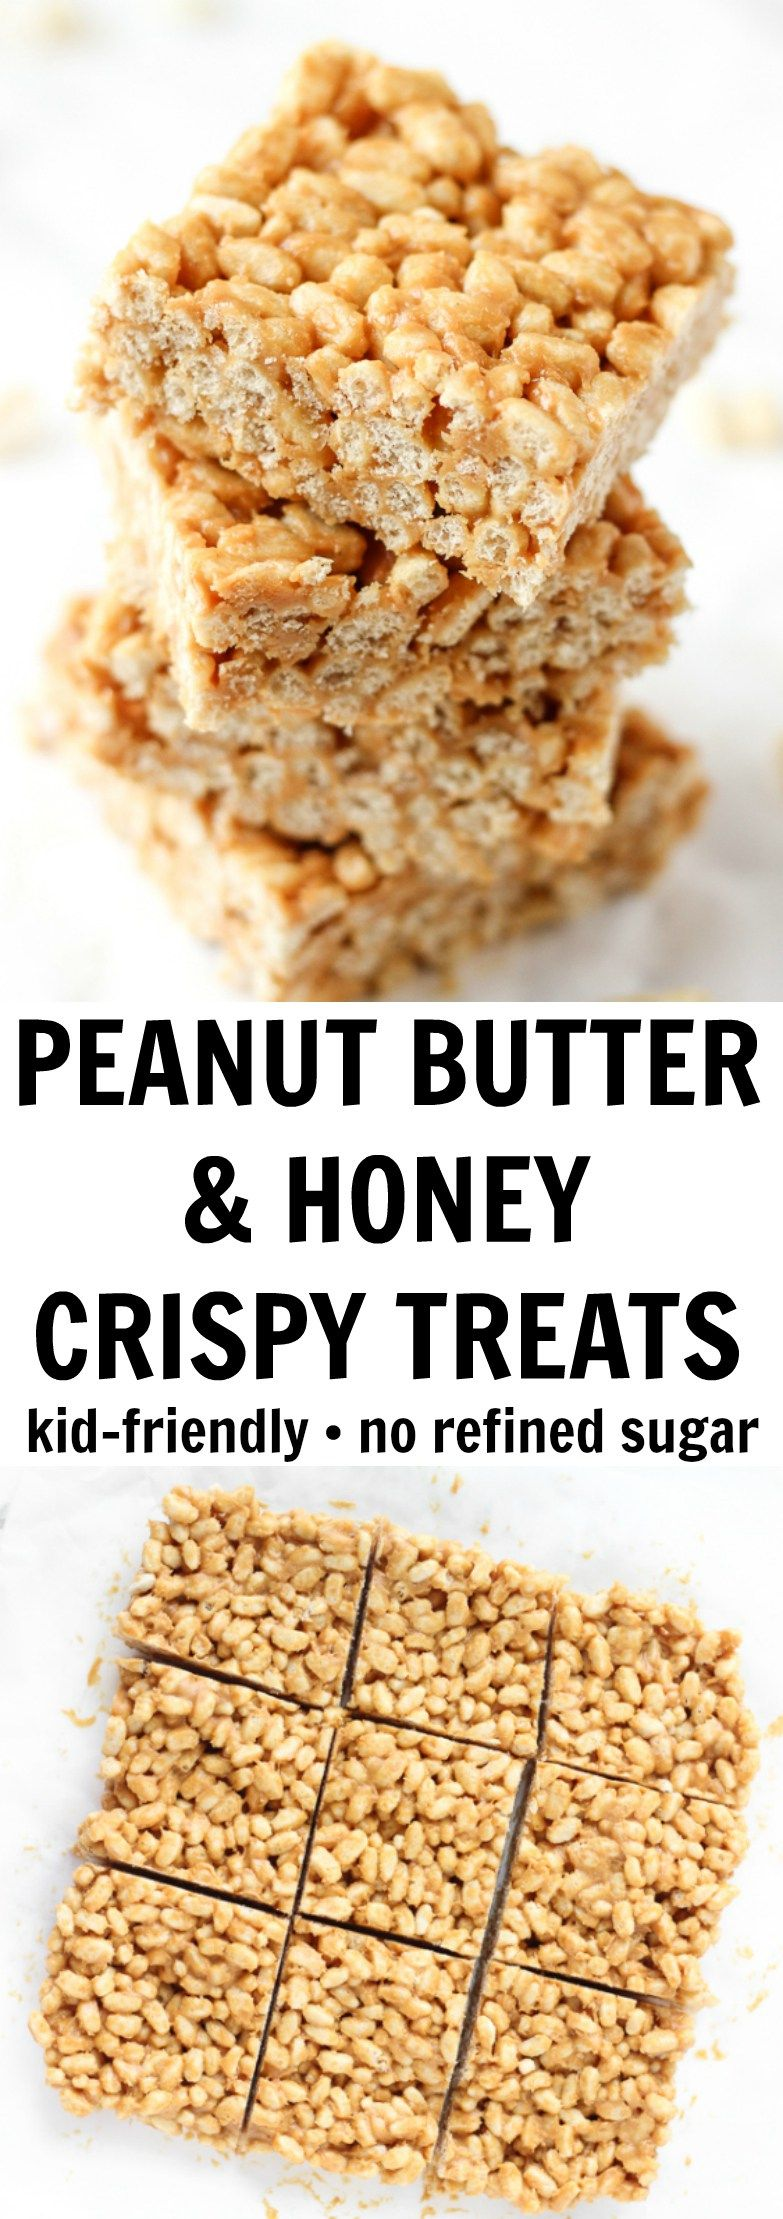 Peanut Butter & Honey Crispy Treats - Healthy Liv